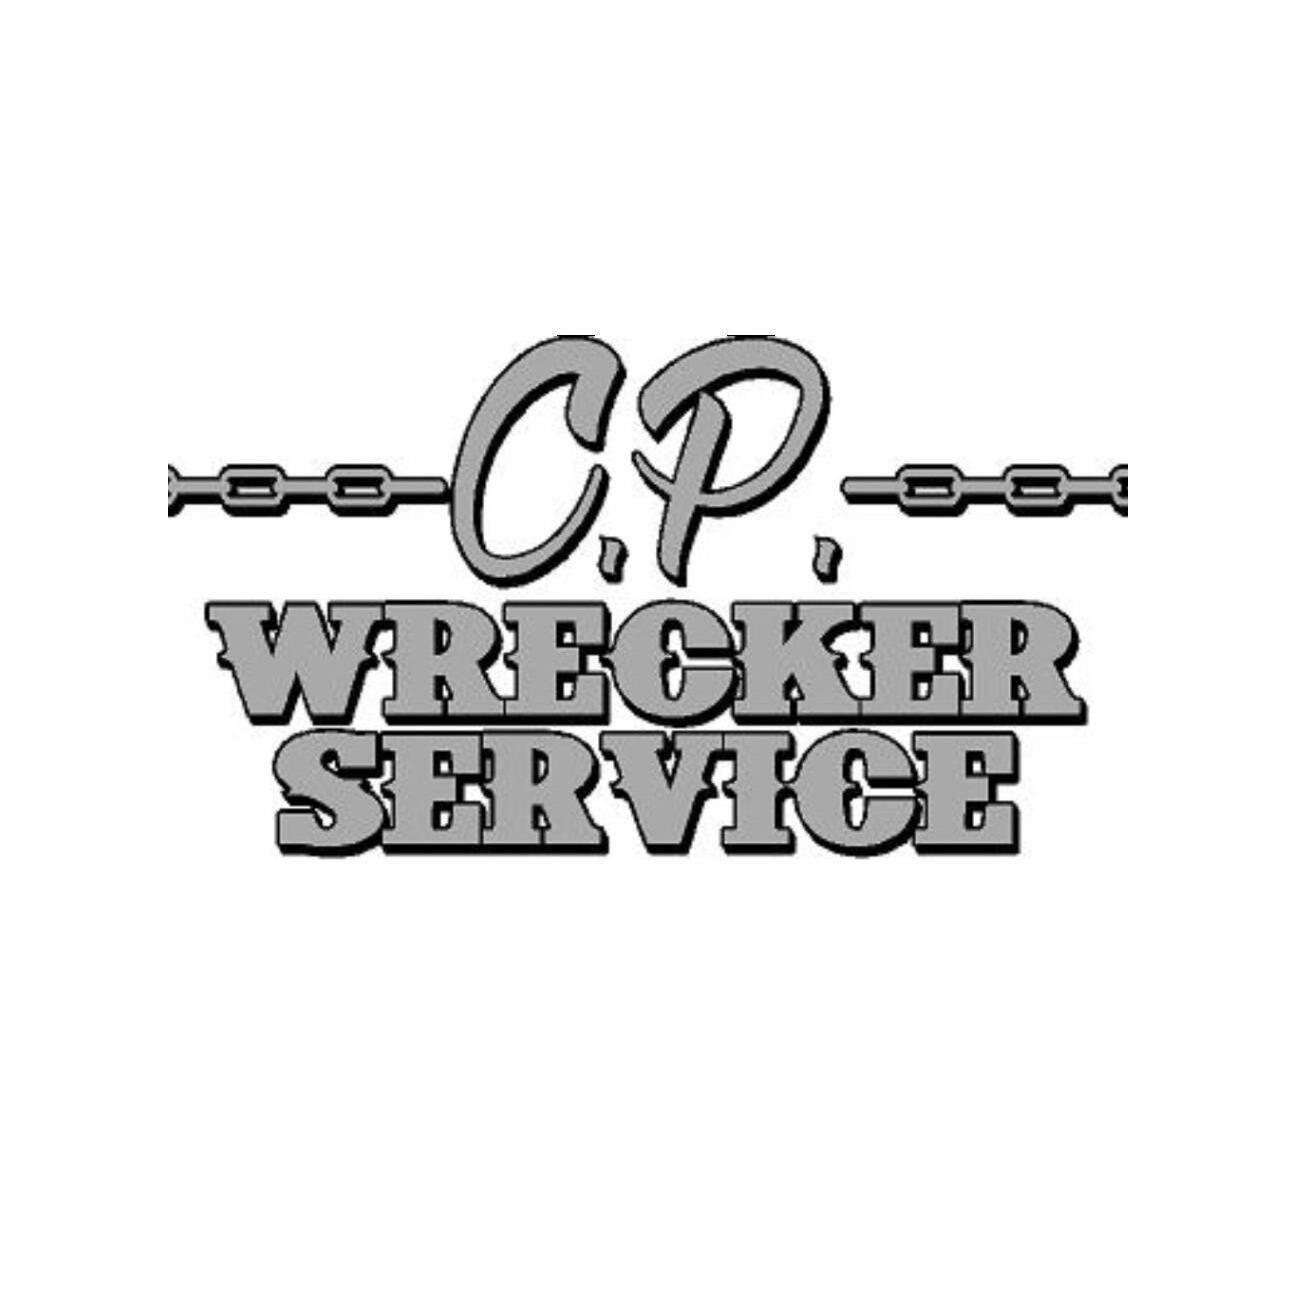 CP Wrecker Service